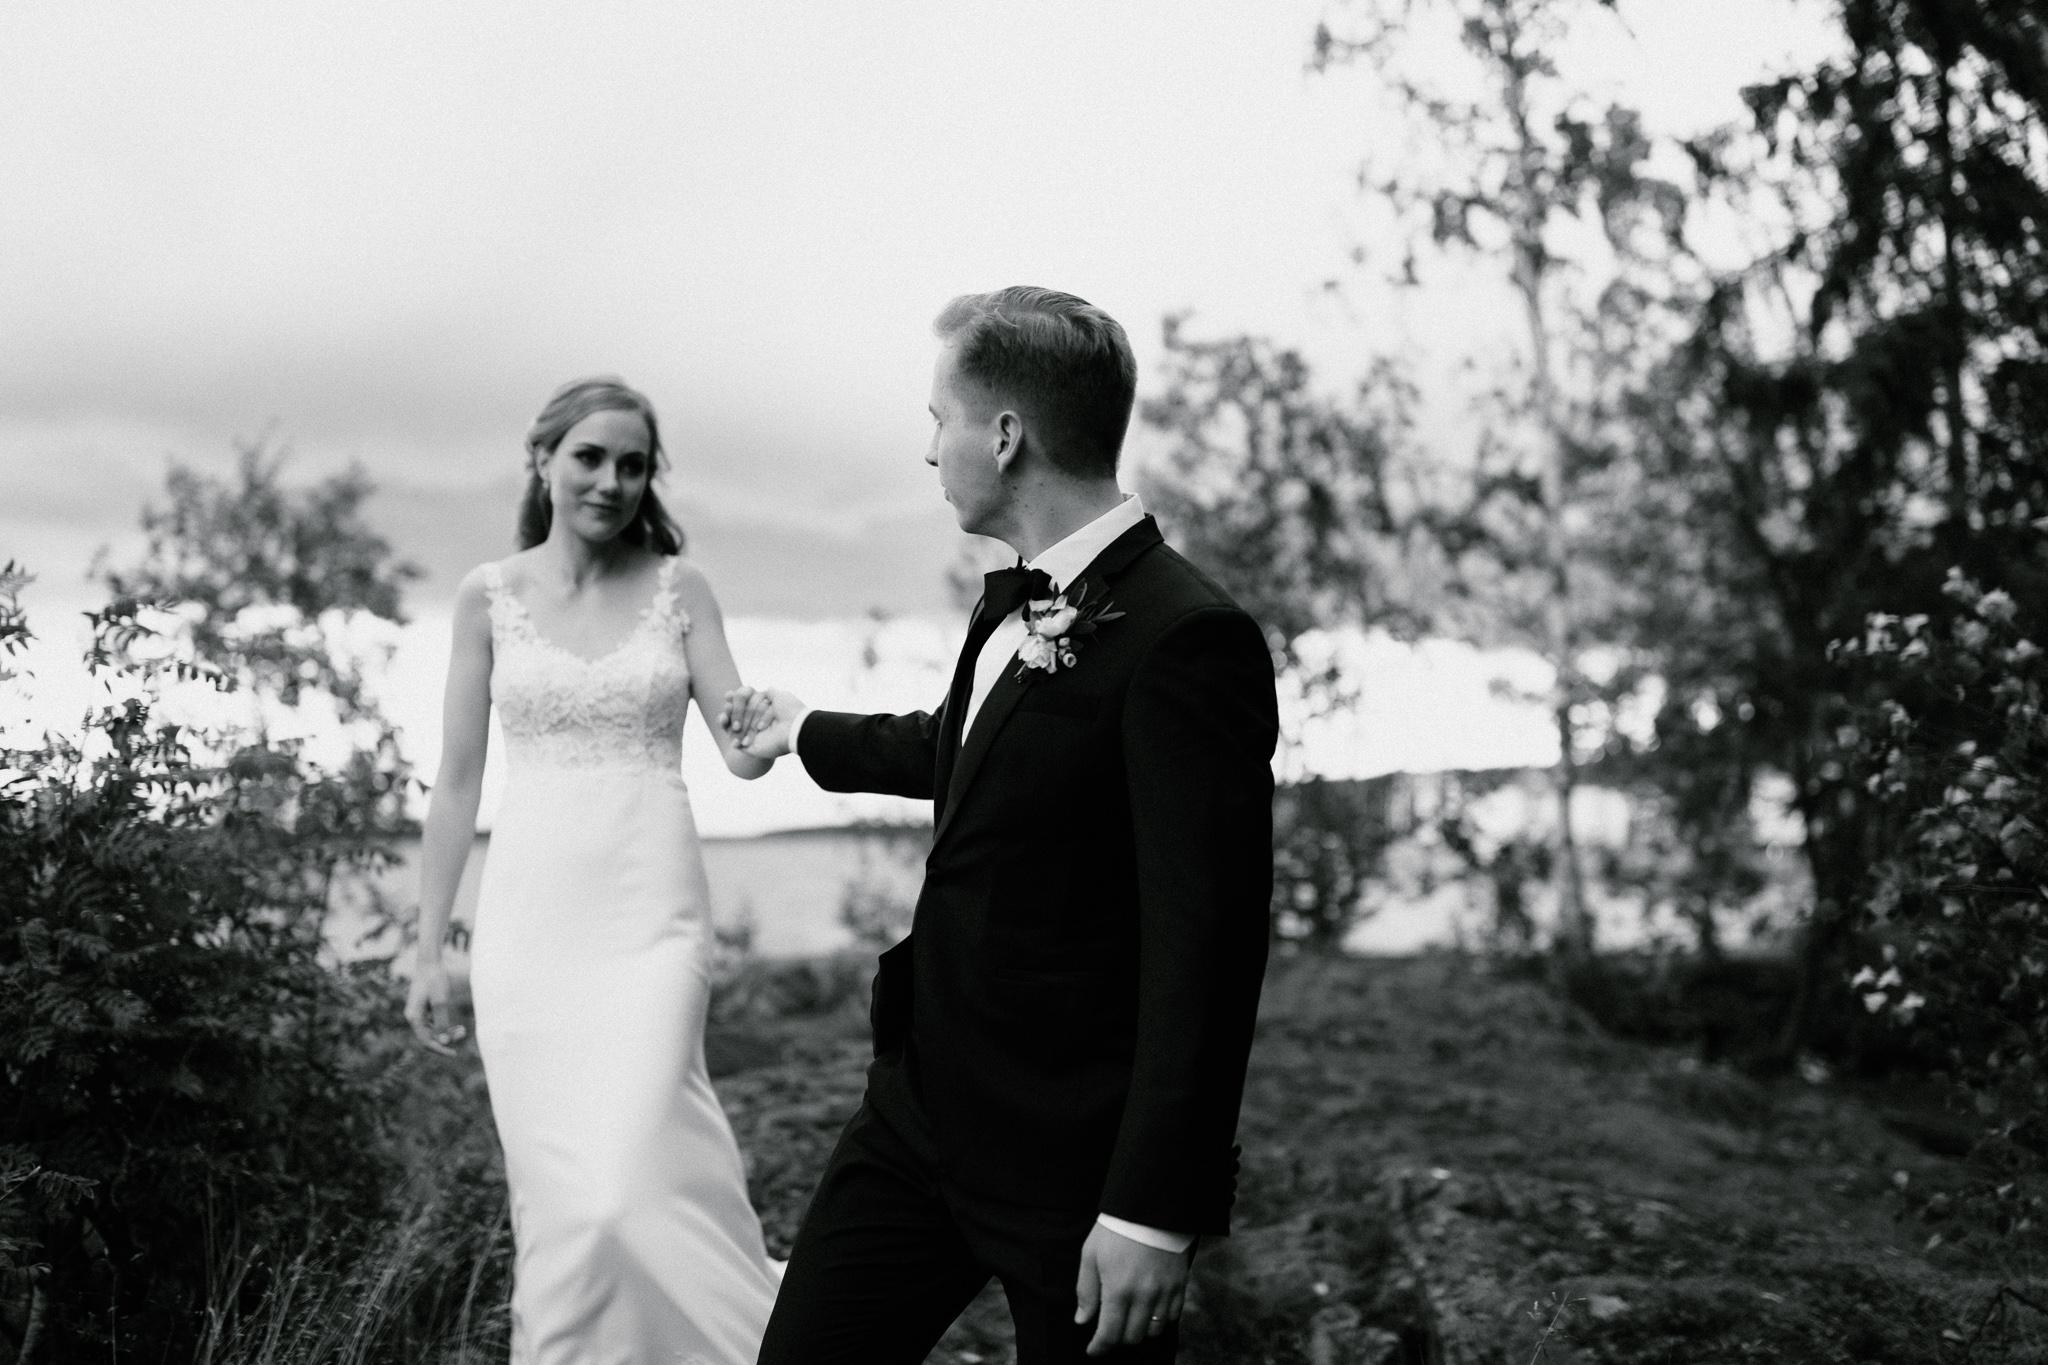 Johanna + Mikko - Tampere - Photo by Patrick Karkkolainen Wedding Photographer-146.jpg